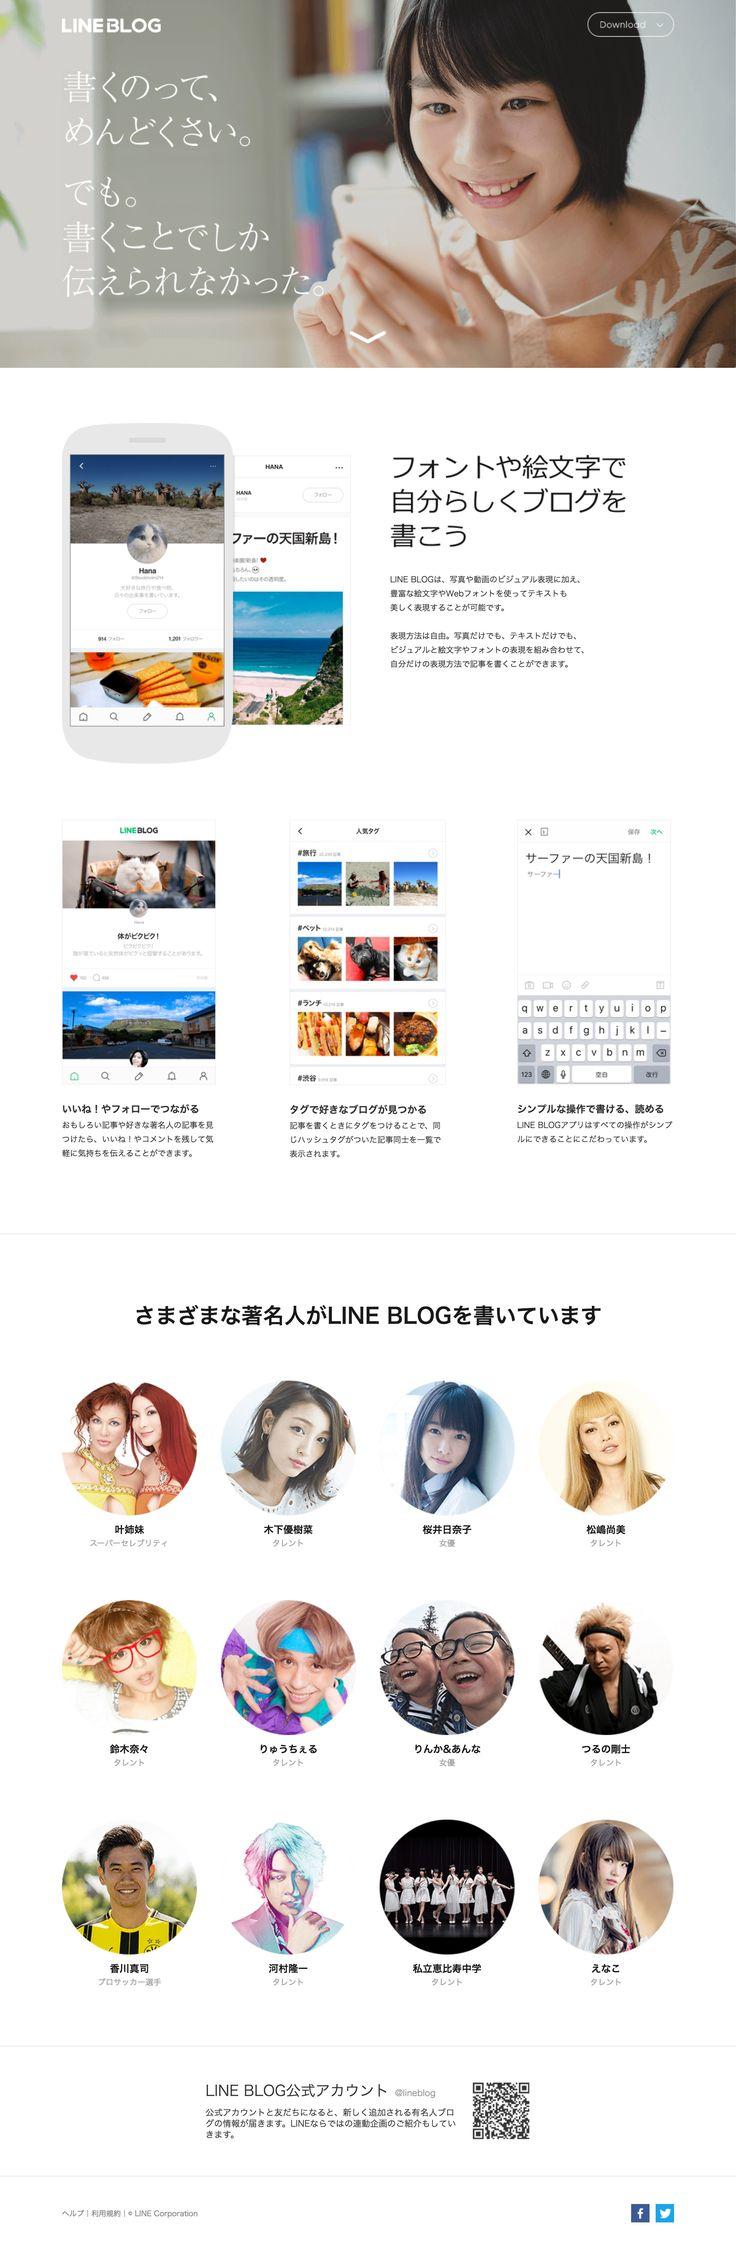 LINE BLOG ライン ブログ landing page - desktop view #line #lineblog #ライン #landingpage #onepage #webdesign